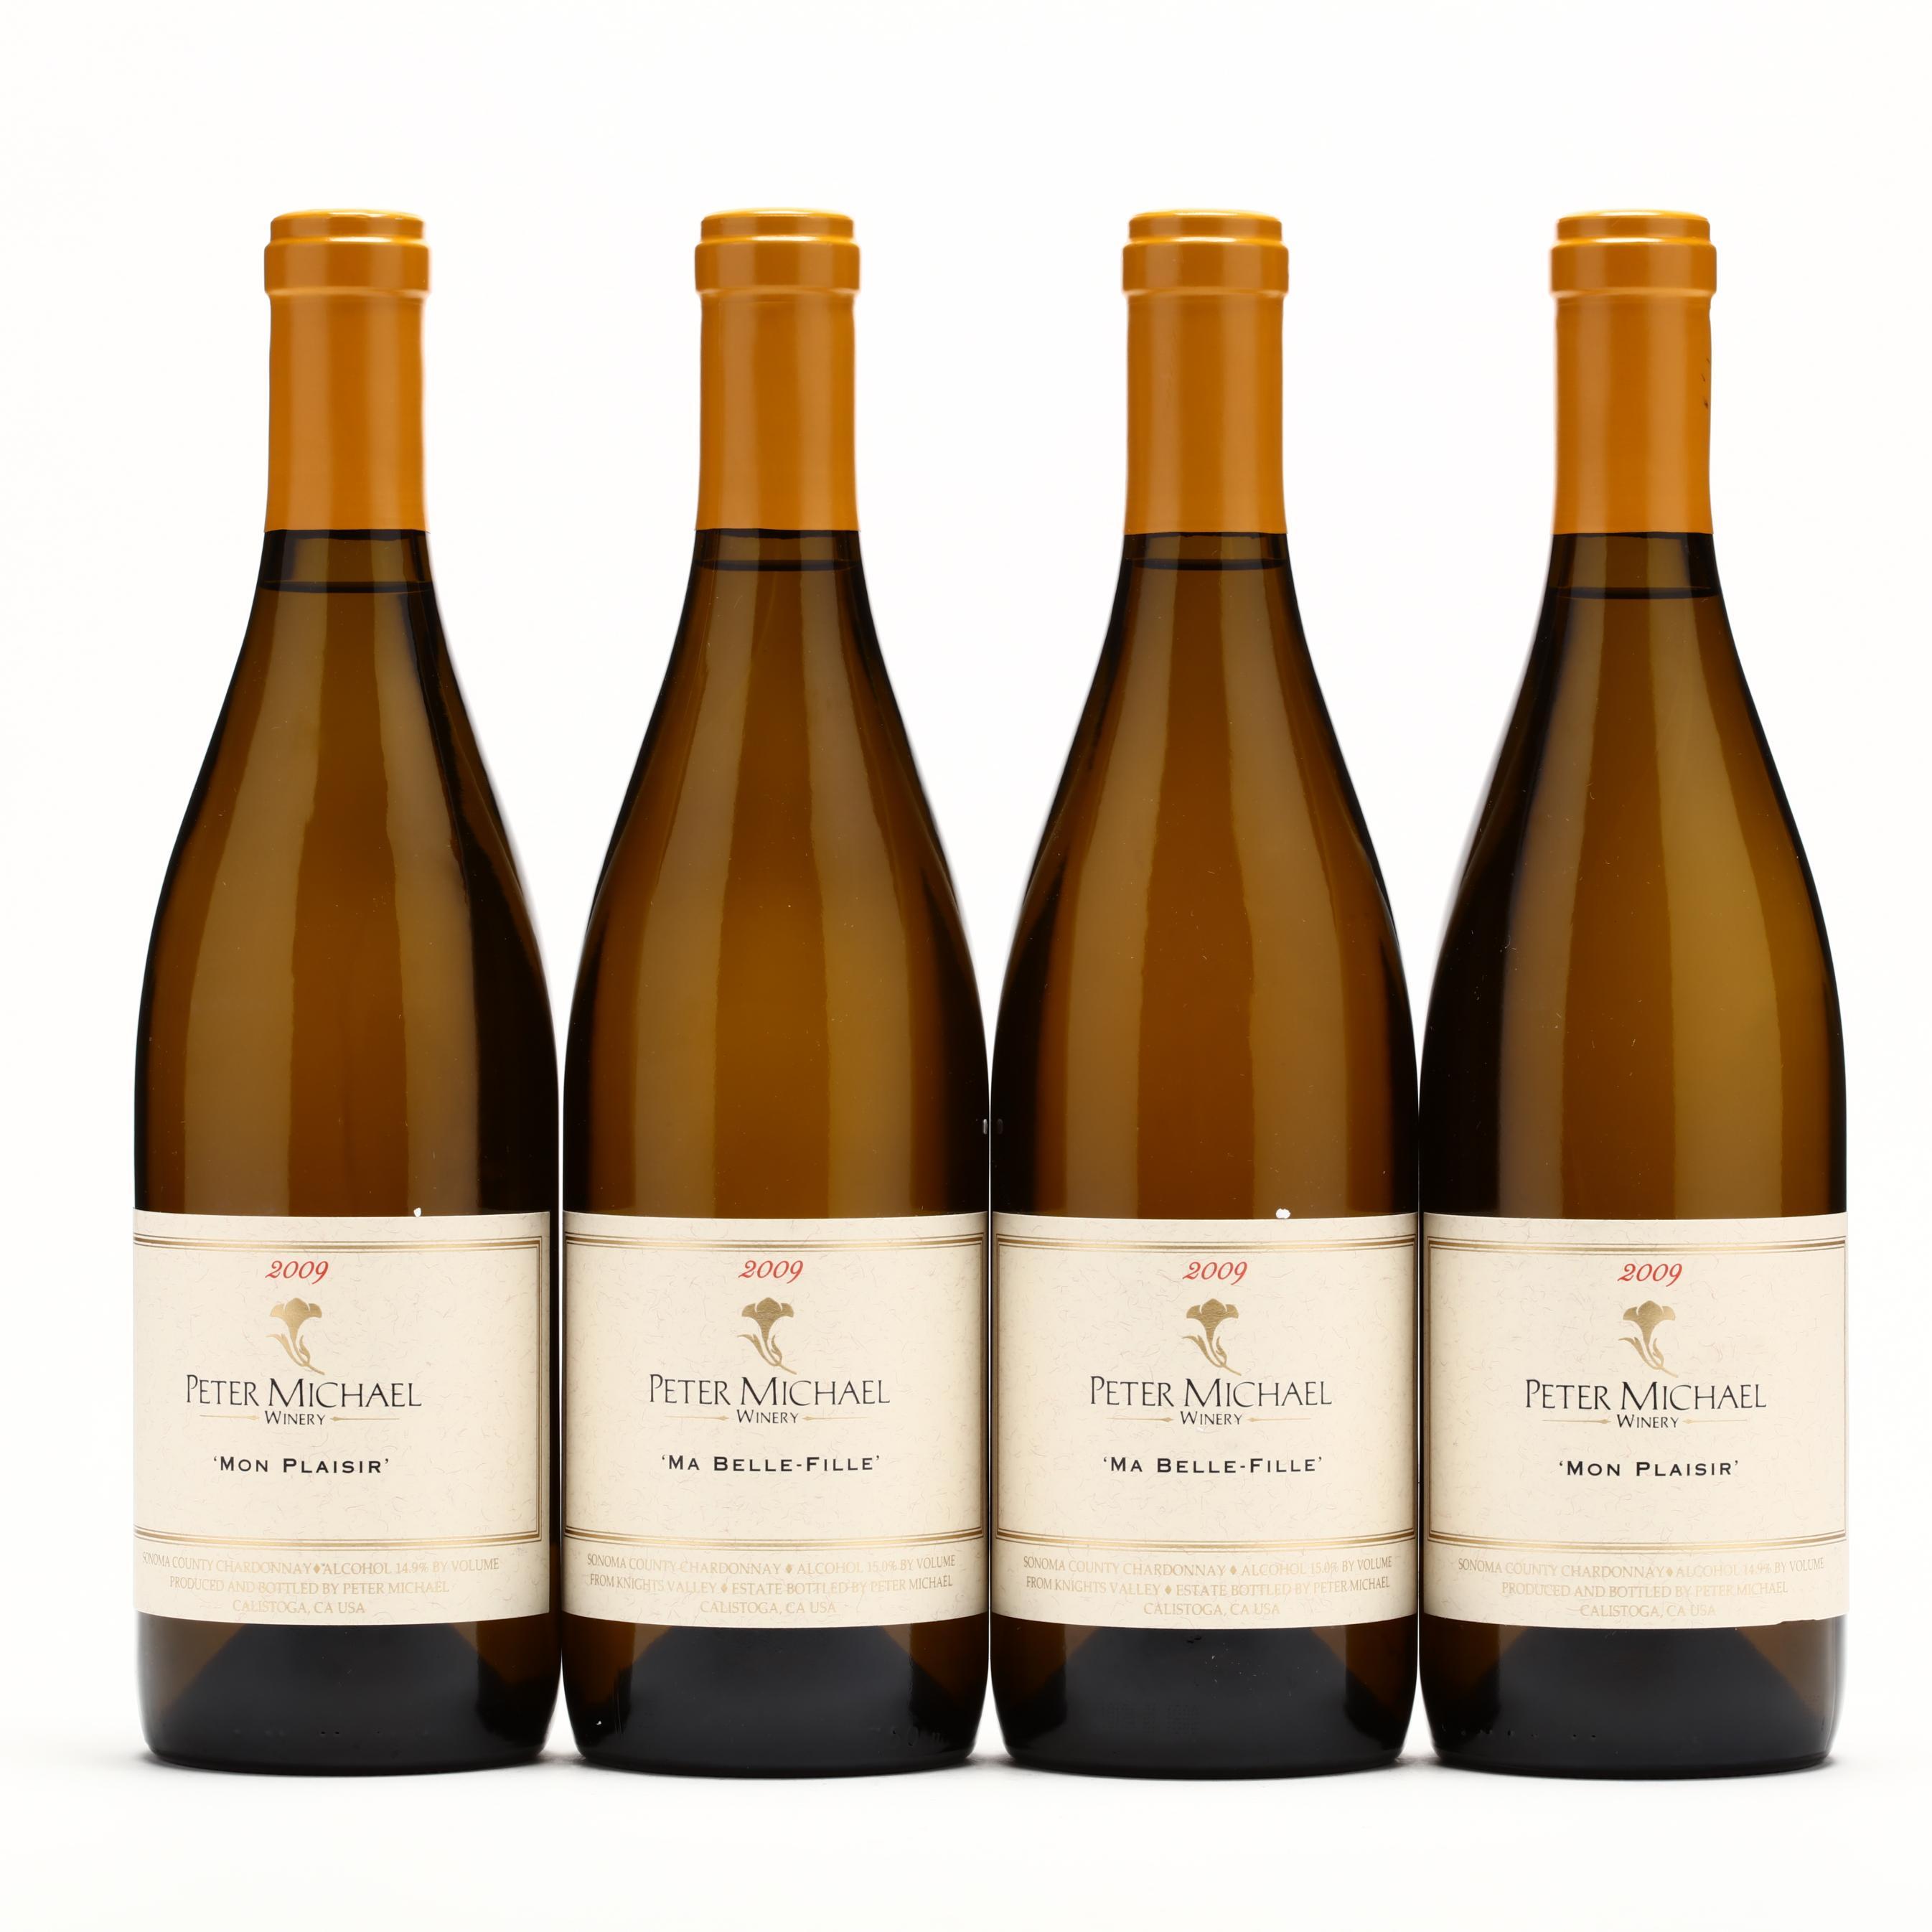 2009-peter-michael-winery